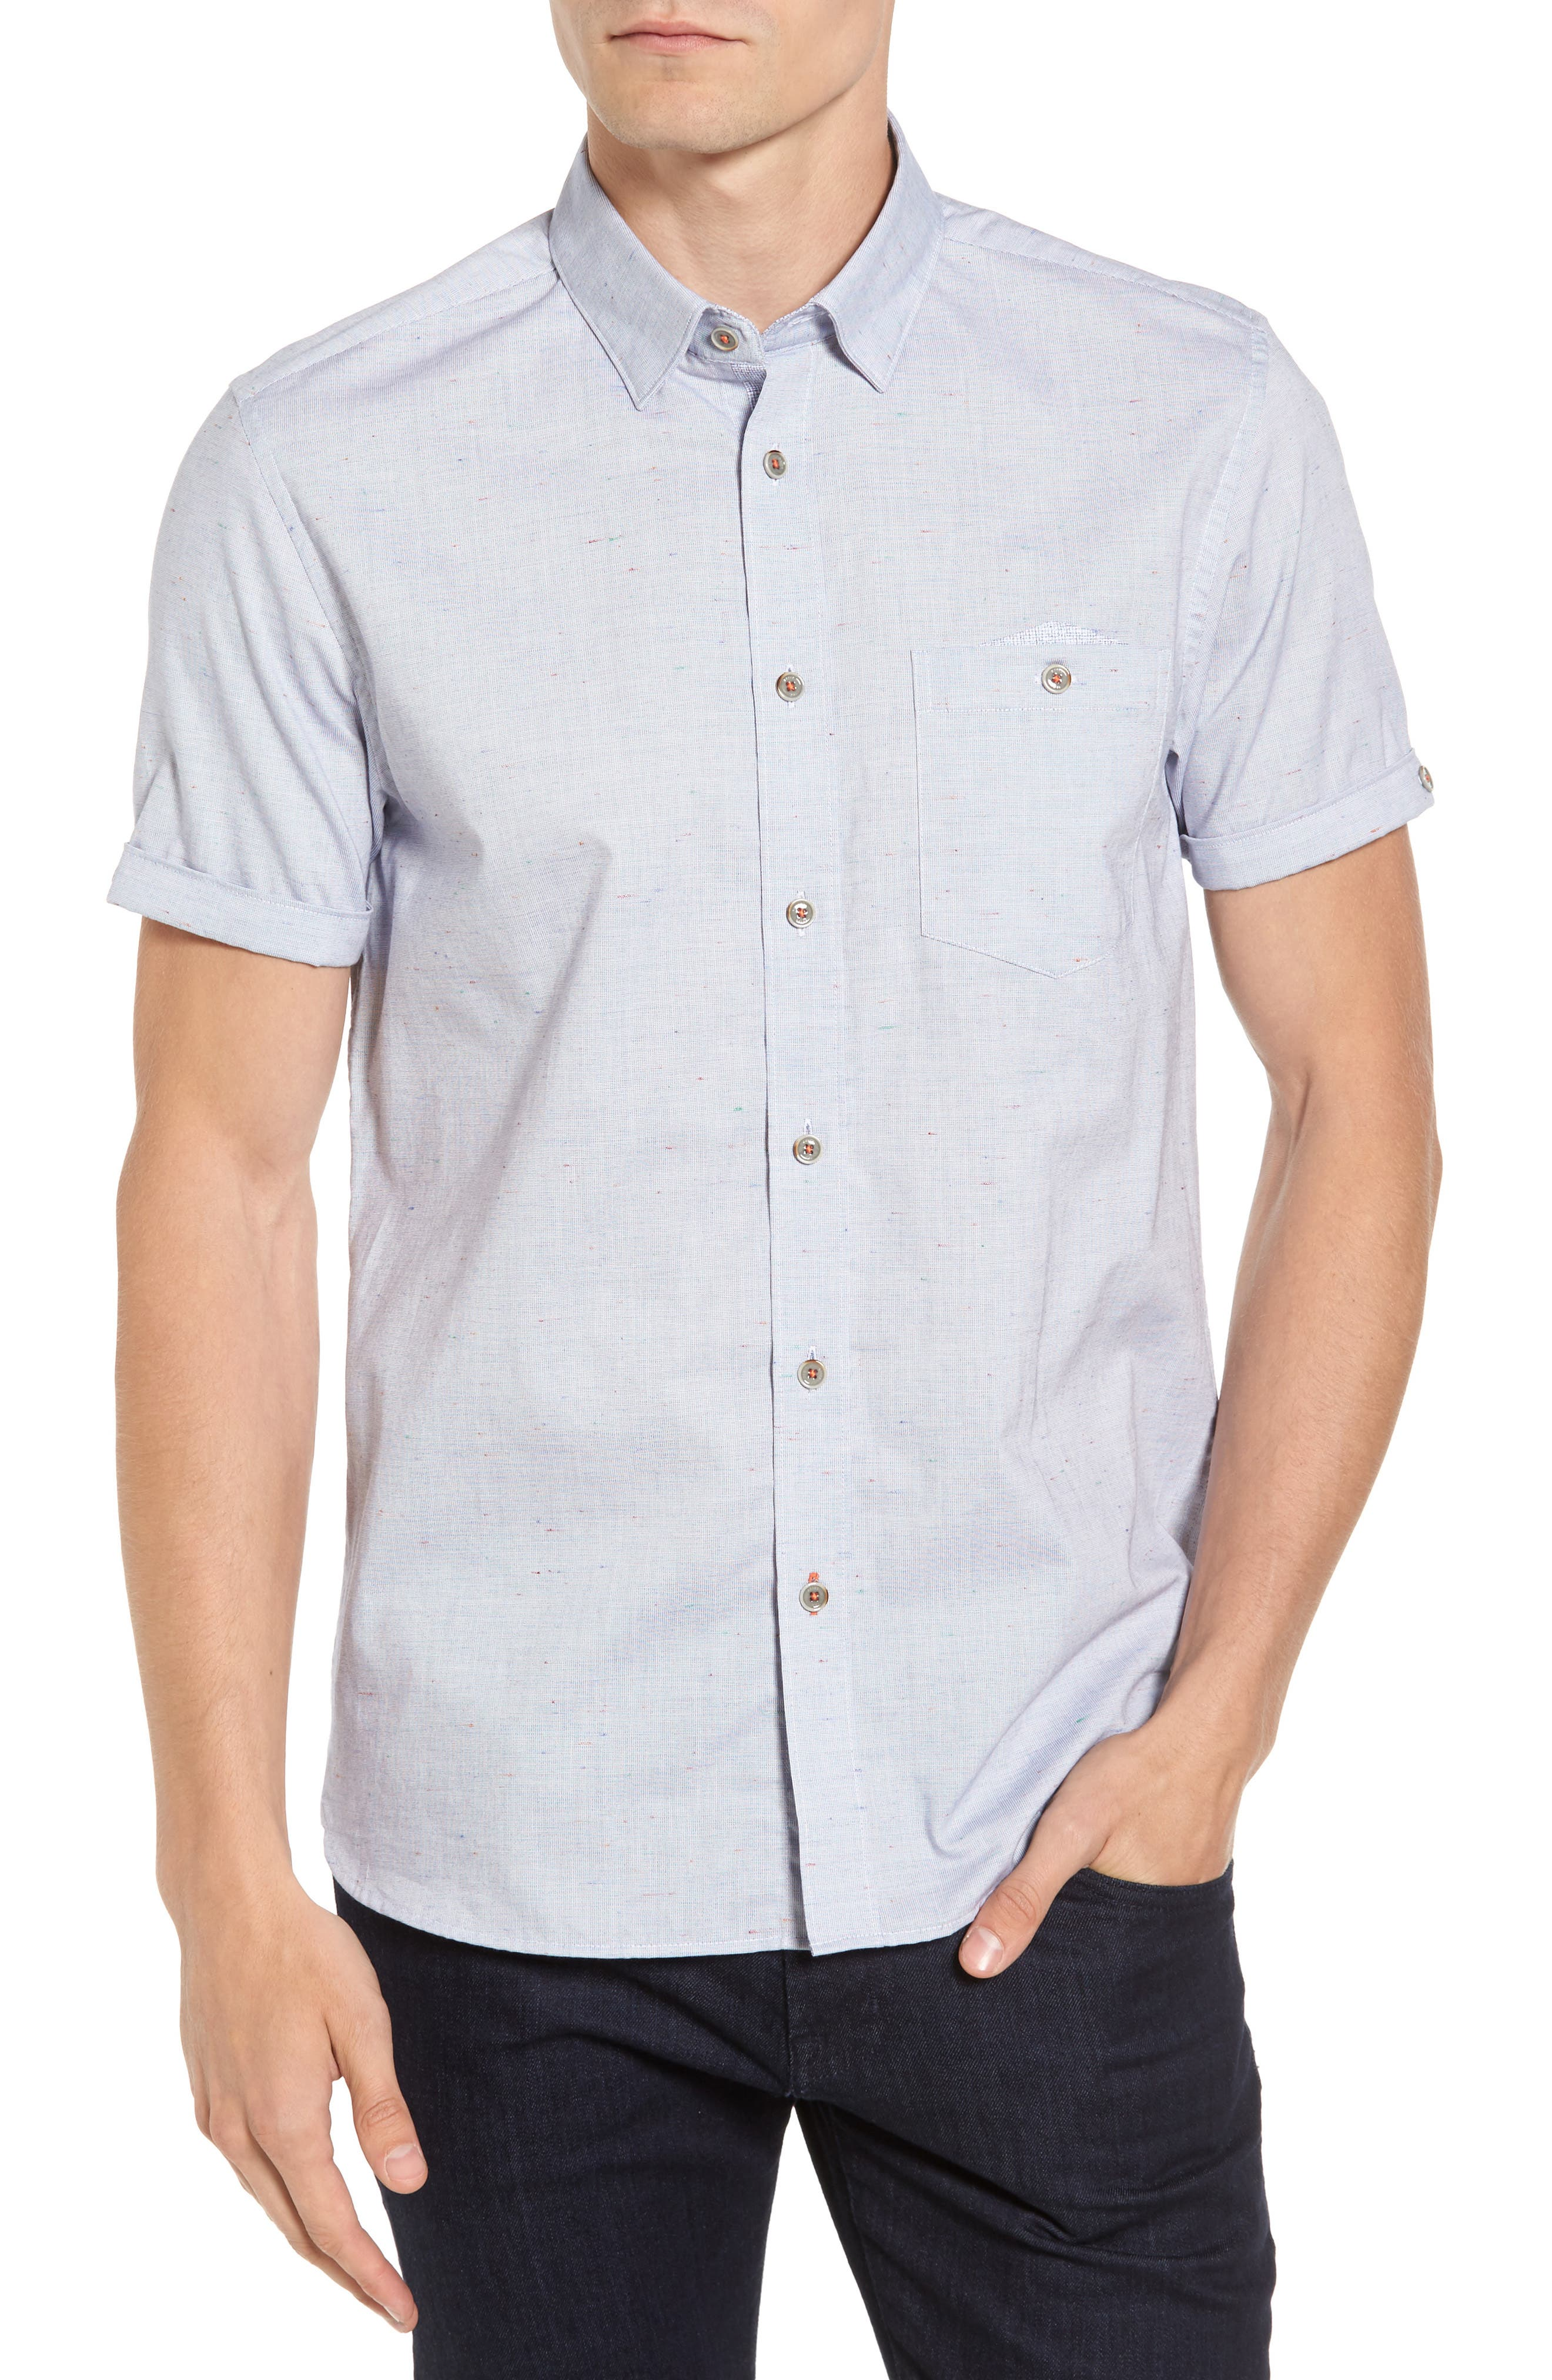 Alternate Image 1 Selected - Ted Baker London Beya Slim Fit Nepped Woven Shirt